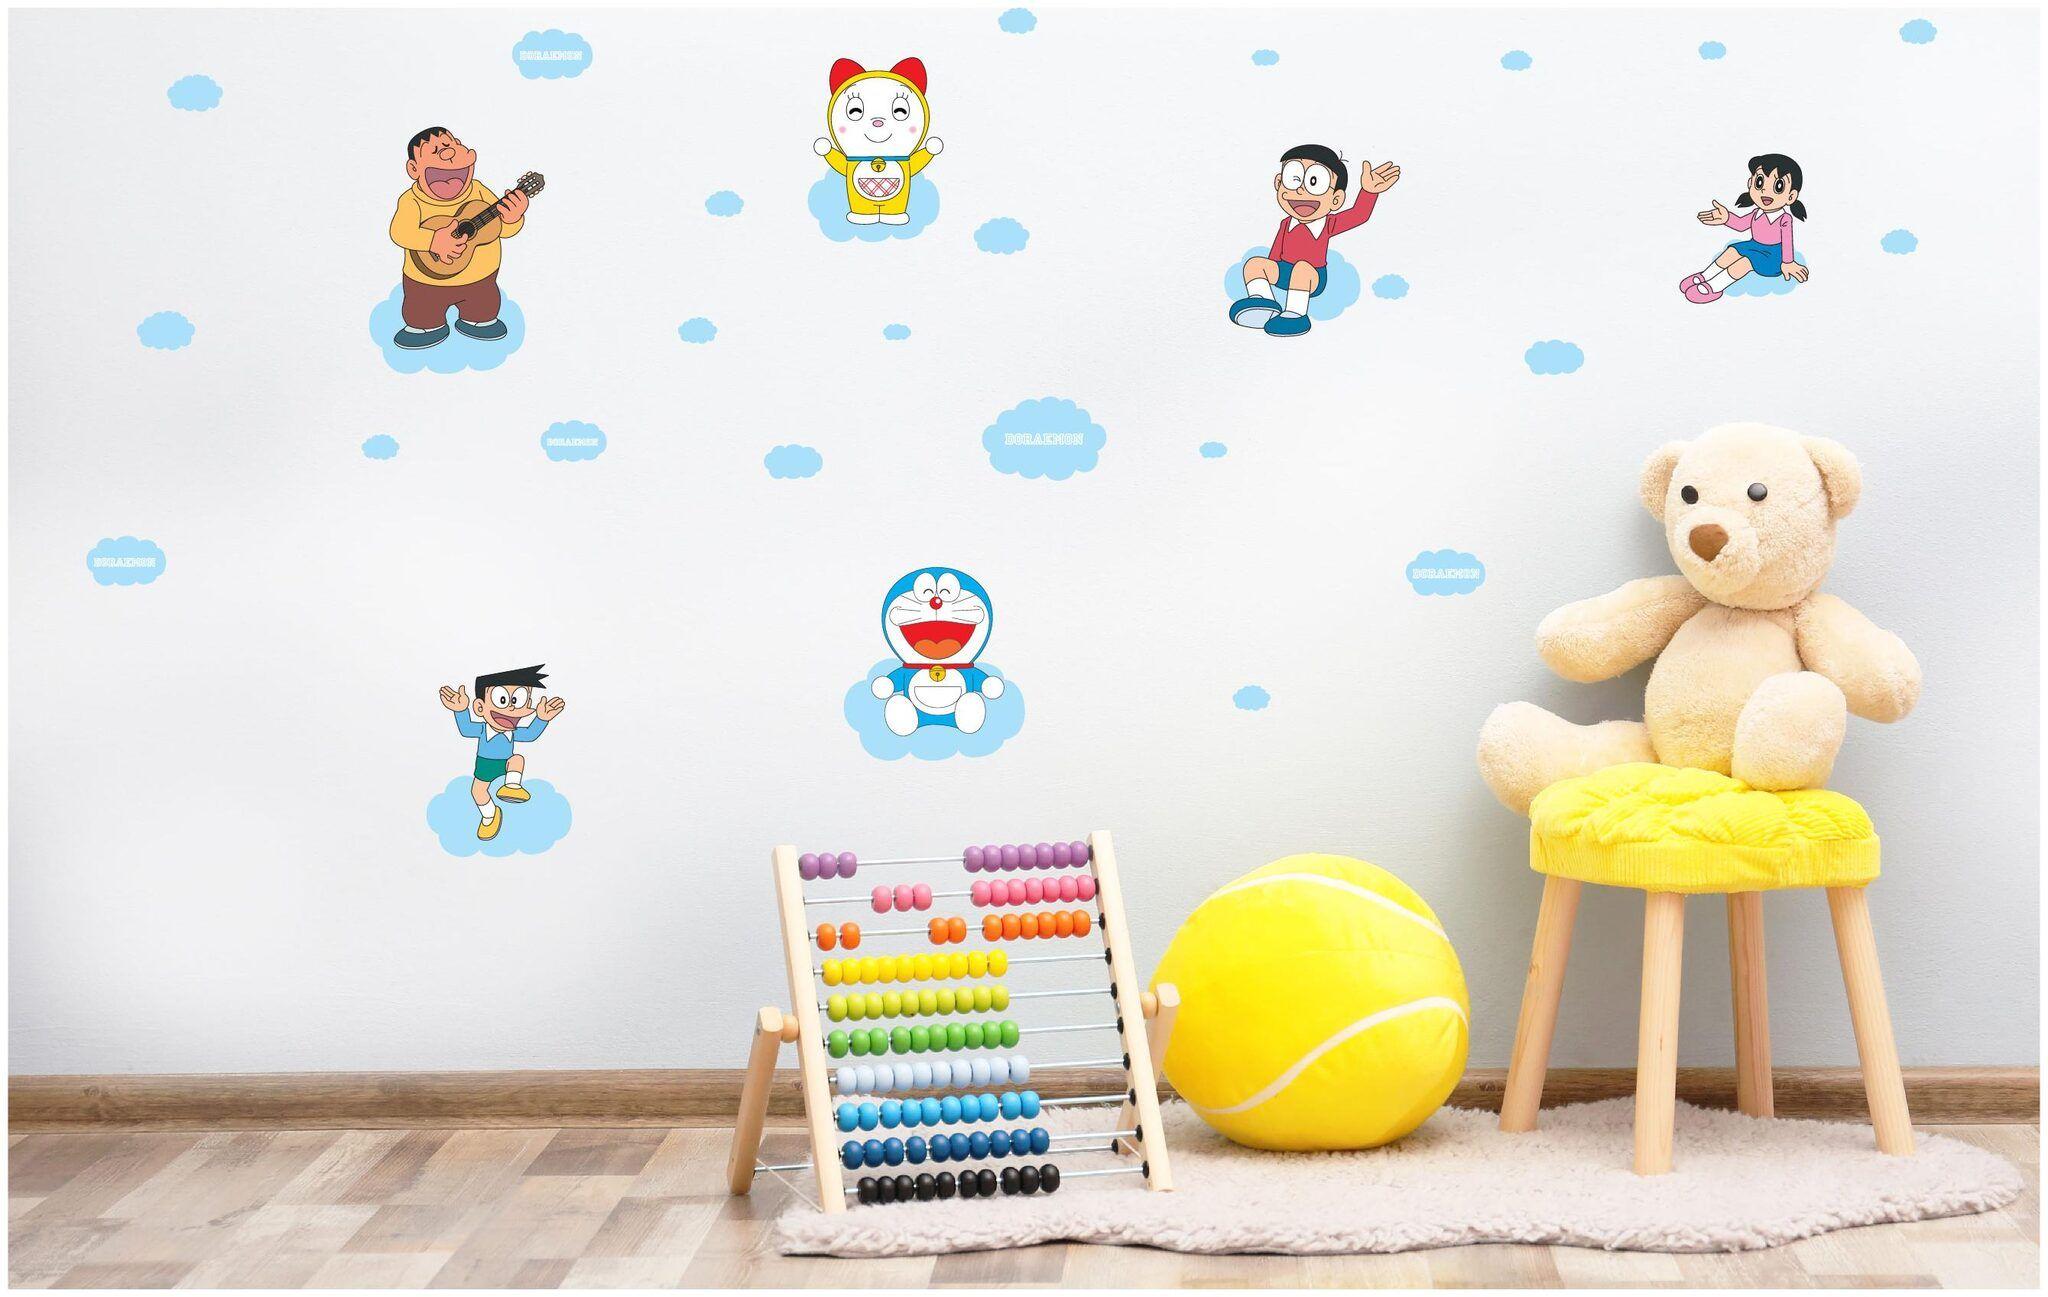 Wallpaper Paper Case Doraemon Asian Paints Wall Ons Original Doraemon Xxl Dorami Nobita And Shizuka In The Sky Removable Wall Sticker 115 Best Doraemon Images